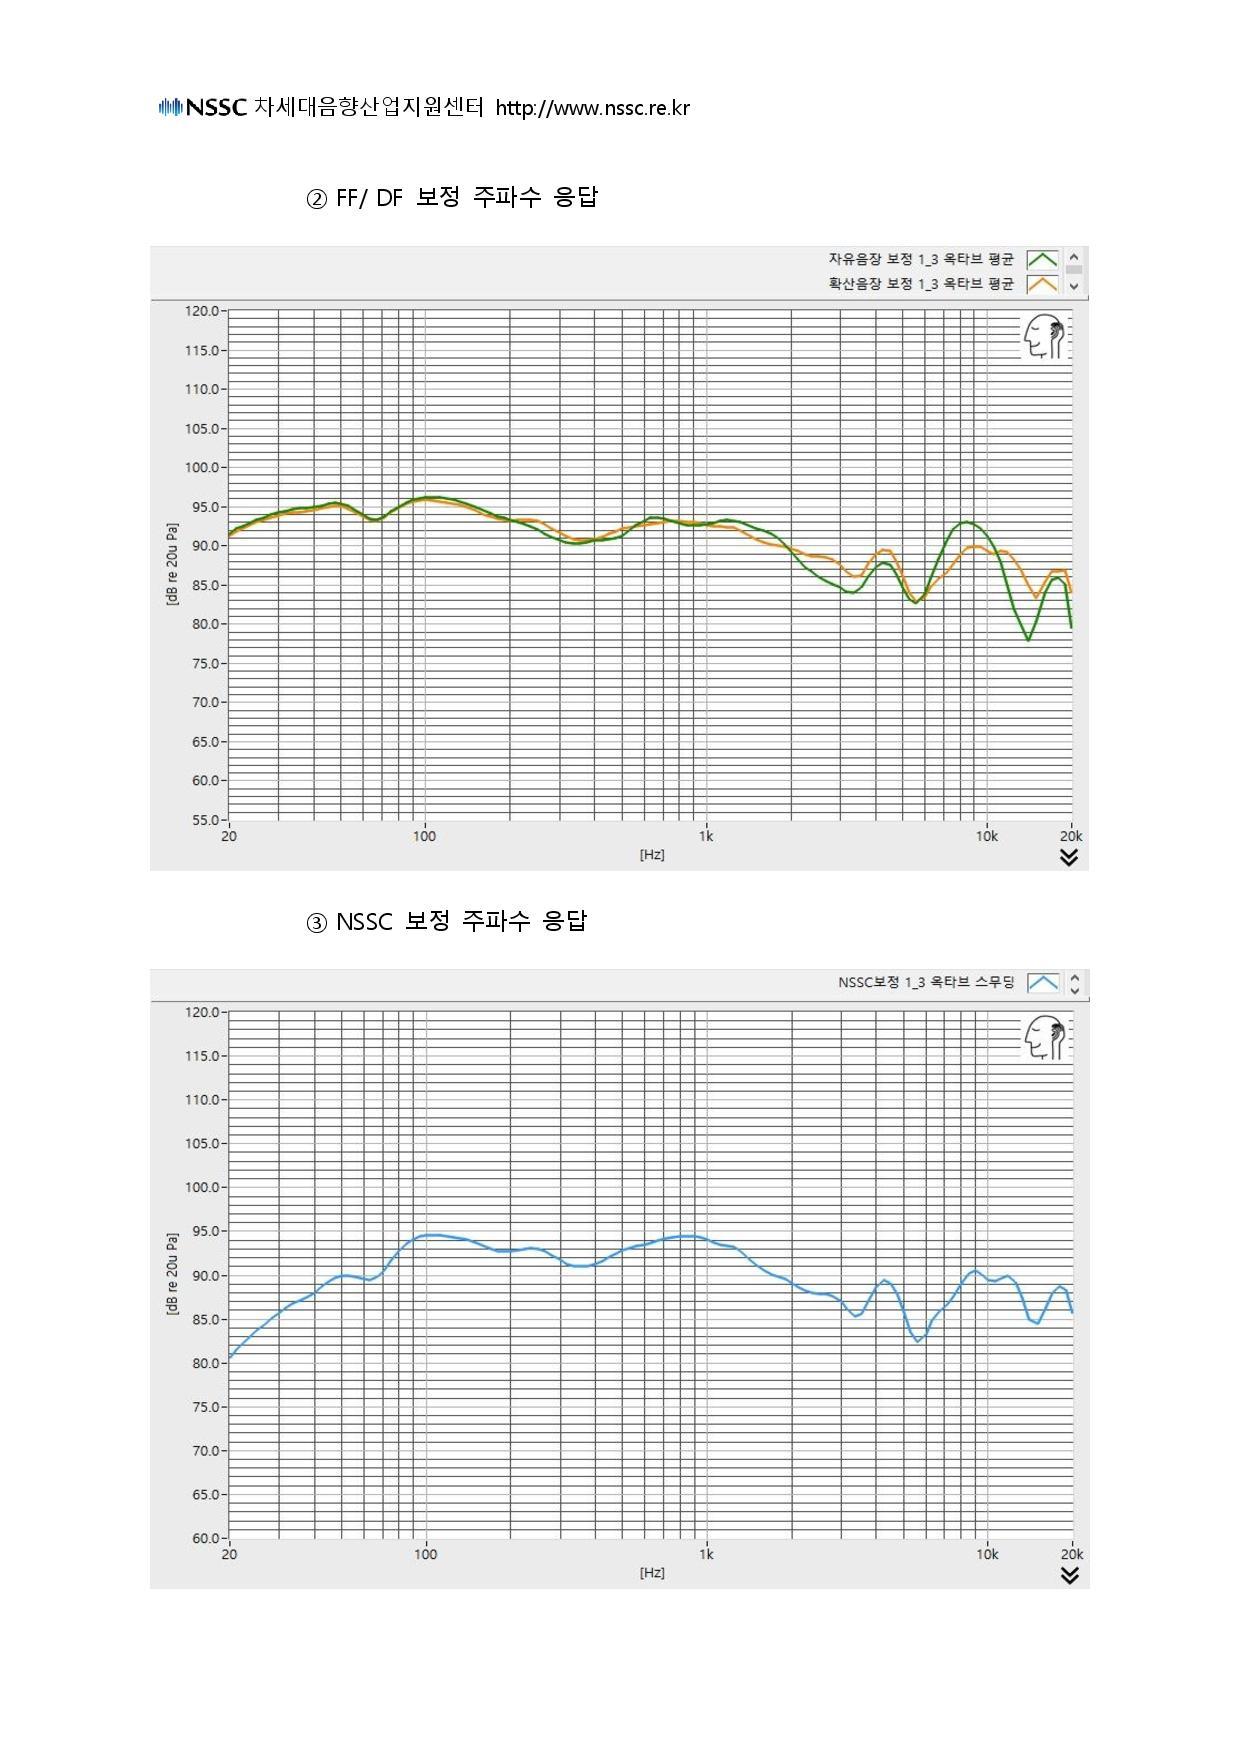 Audio-technica ATH-M50x-page-005.jpg